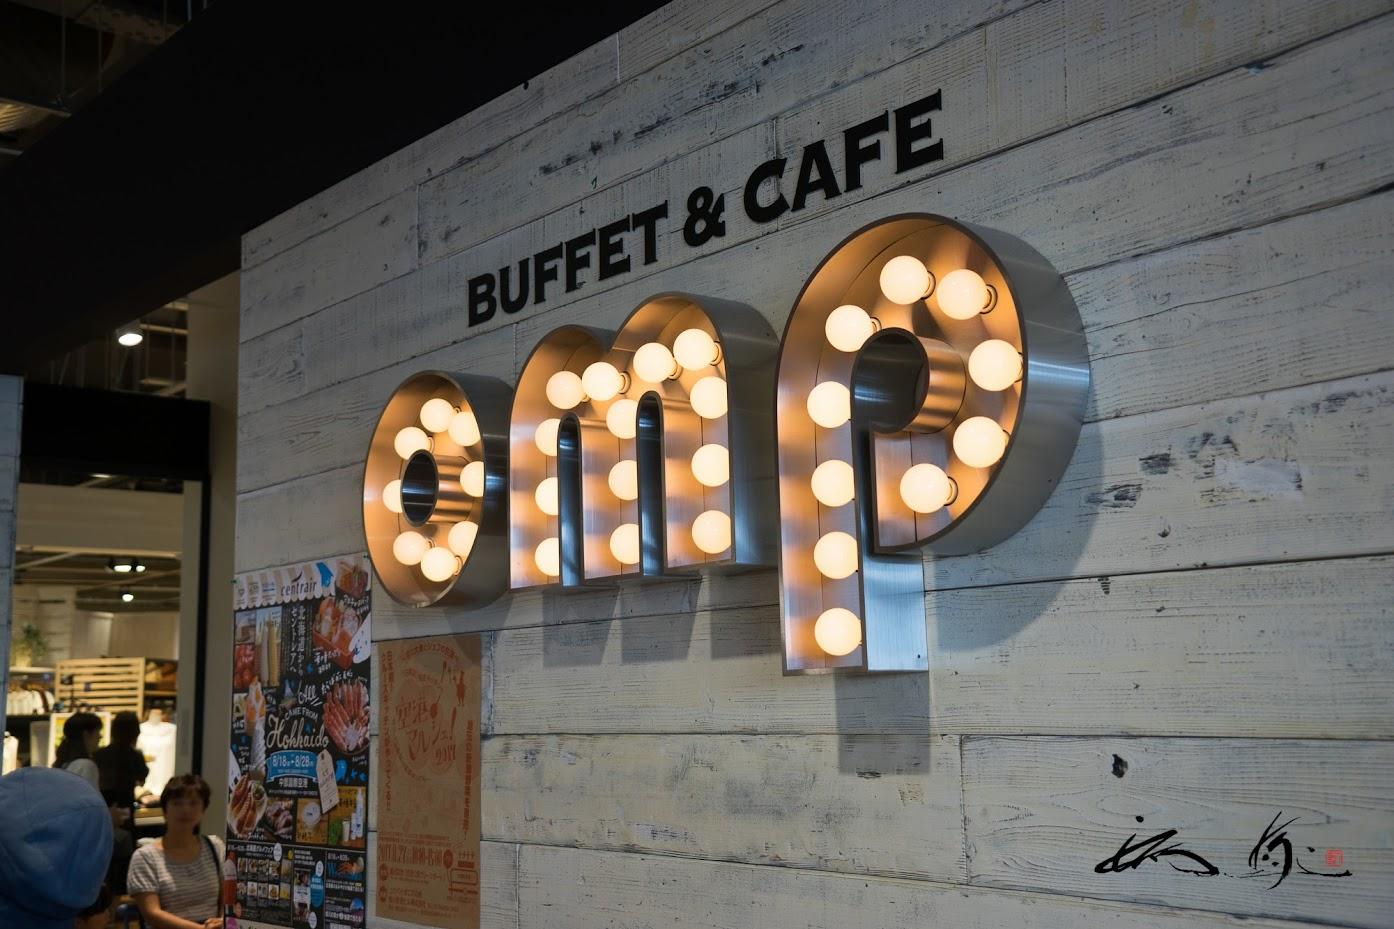 BUFFET & CAFE omp(ブッフェ アンド カフェオンプ)